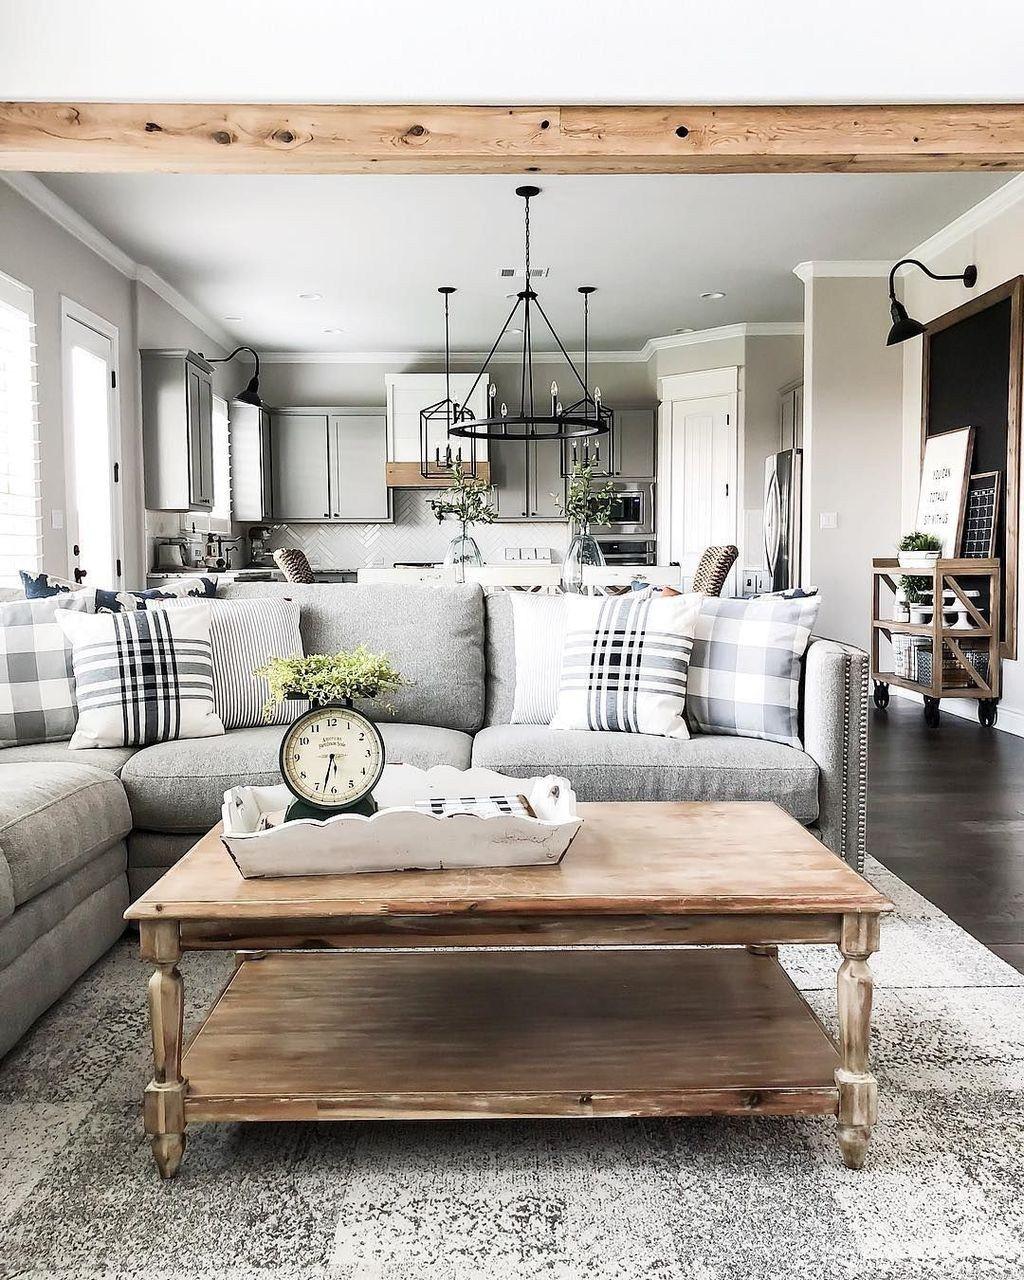 Cozy Farmhouse Living Room Decor Ideas 53: 46 Cozy Farmhouse Living Room Design Ideas That Make Calm